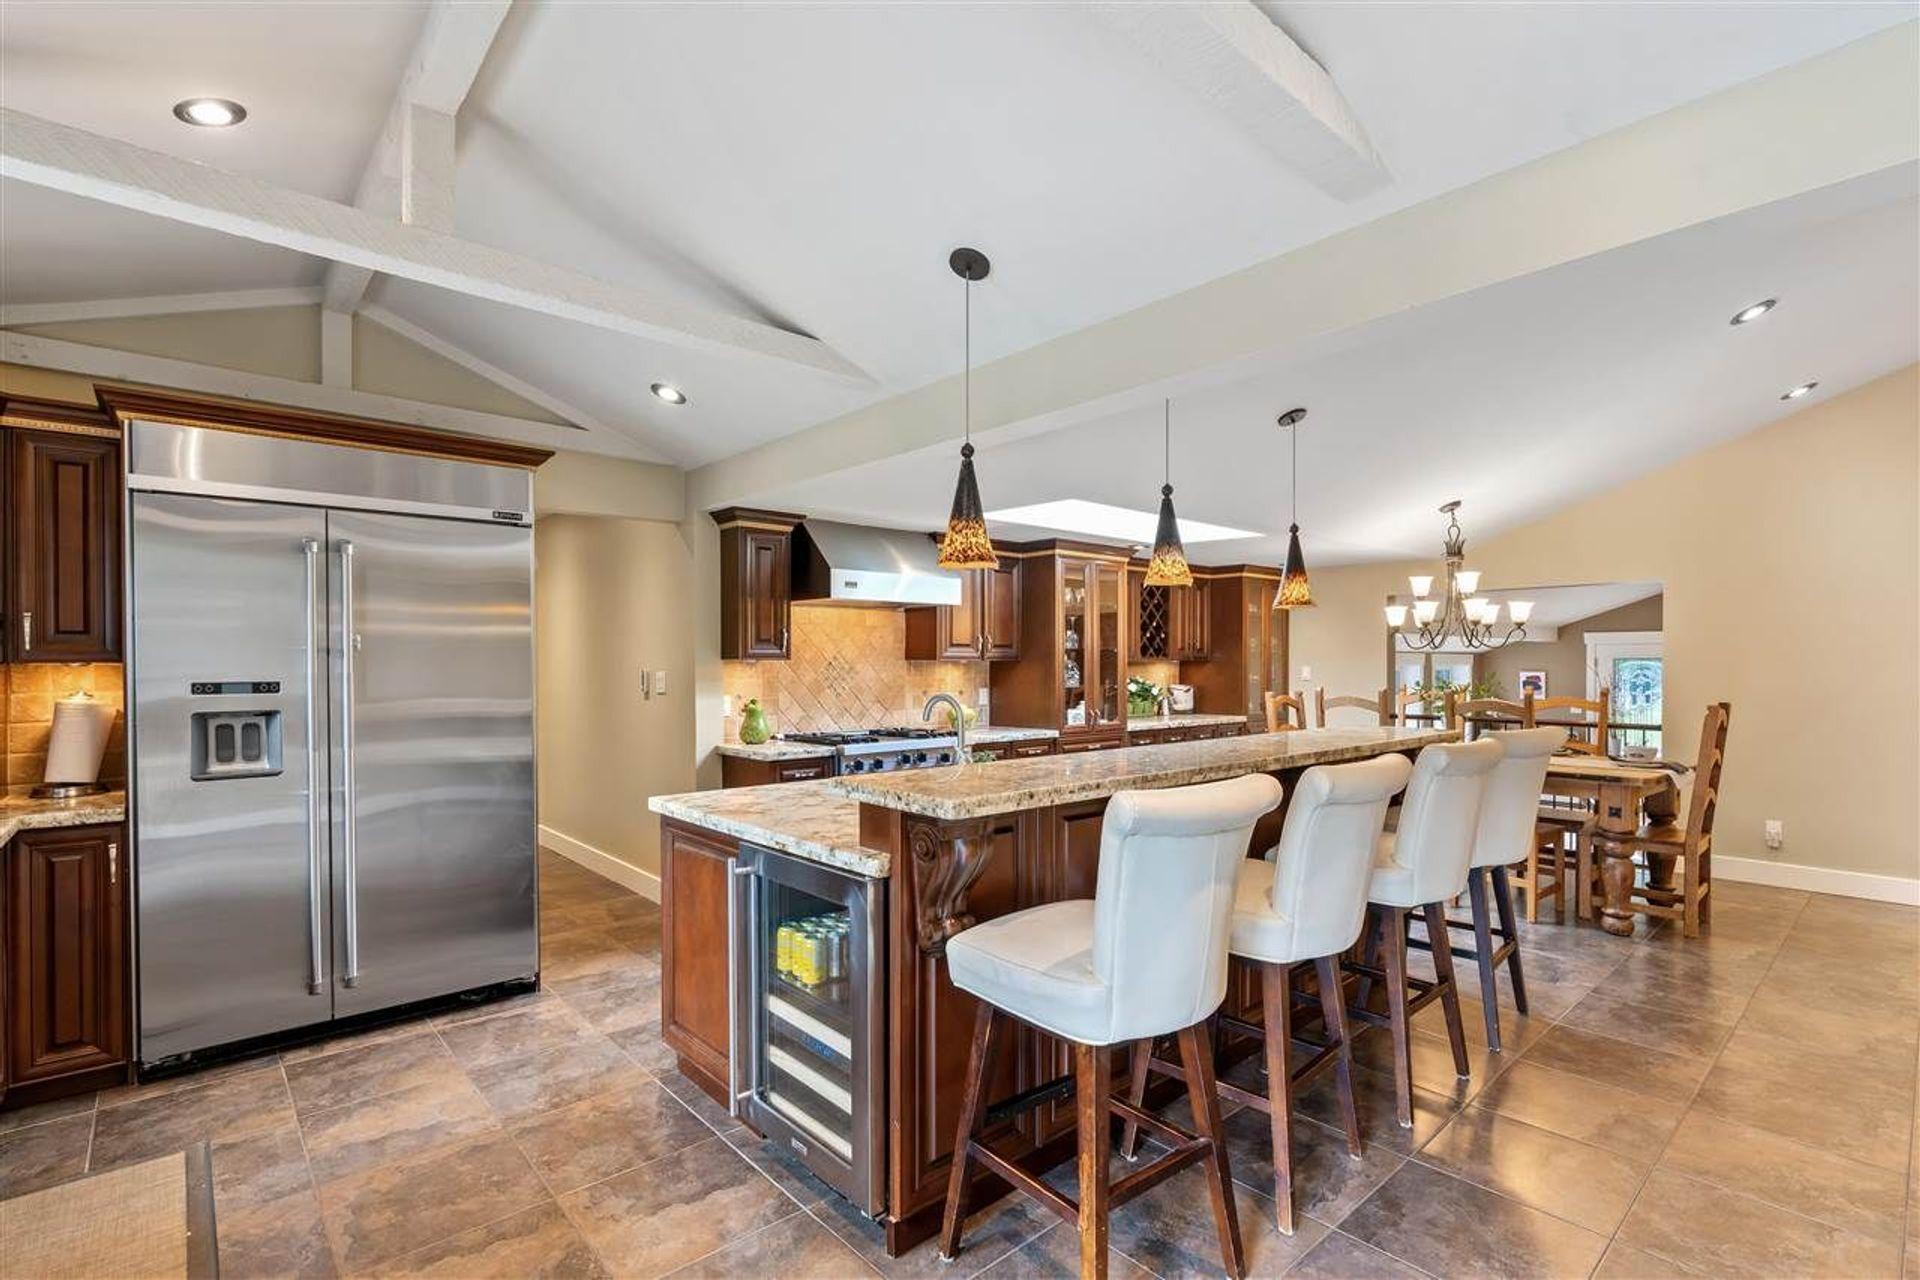 24852-ferguson-avenue-cottonwood-mr-maple-ridge-13 of 24852 Ferguson Avenue, Cottonwood MR, Maple Ridge